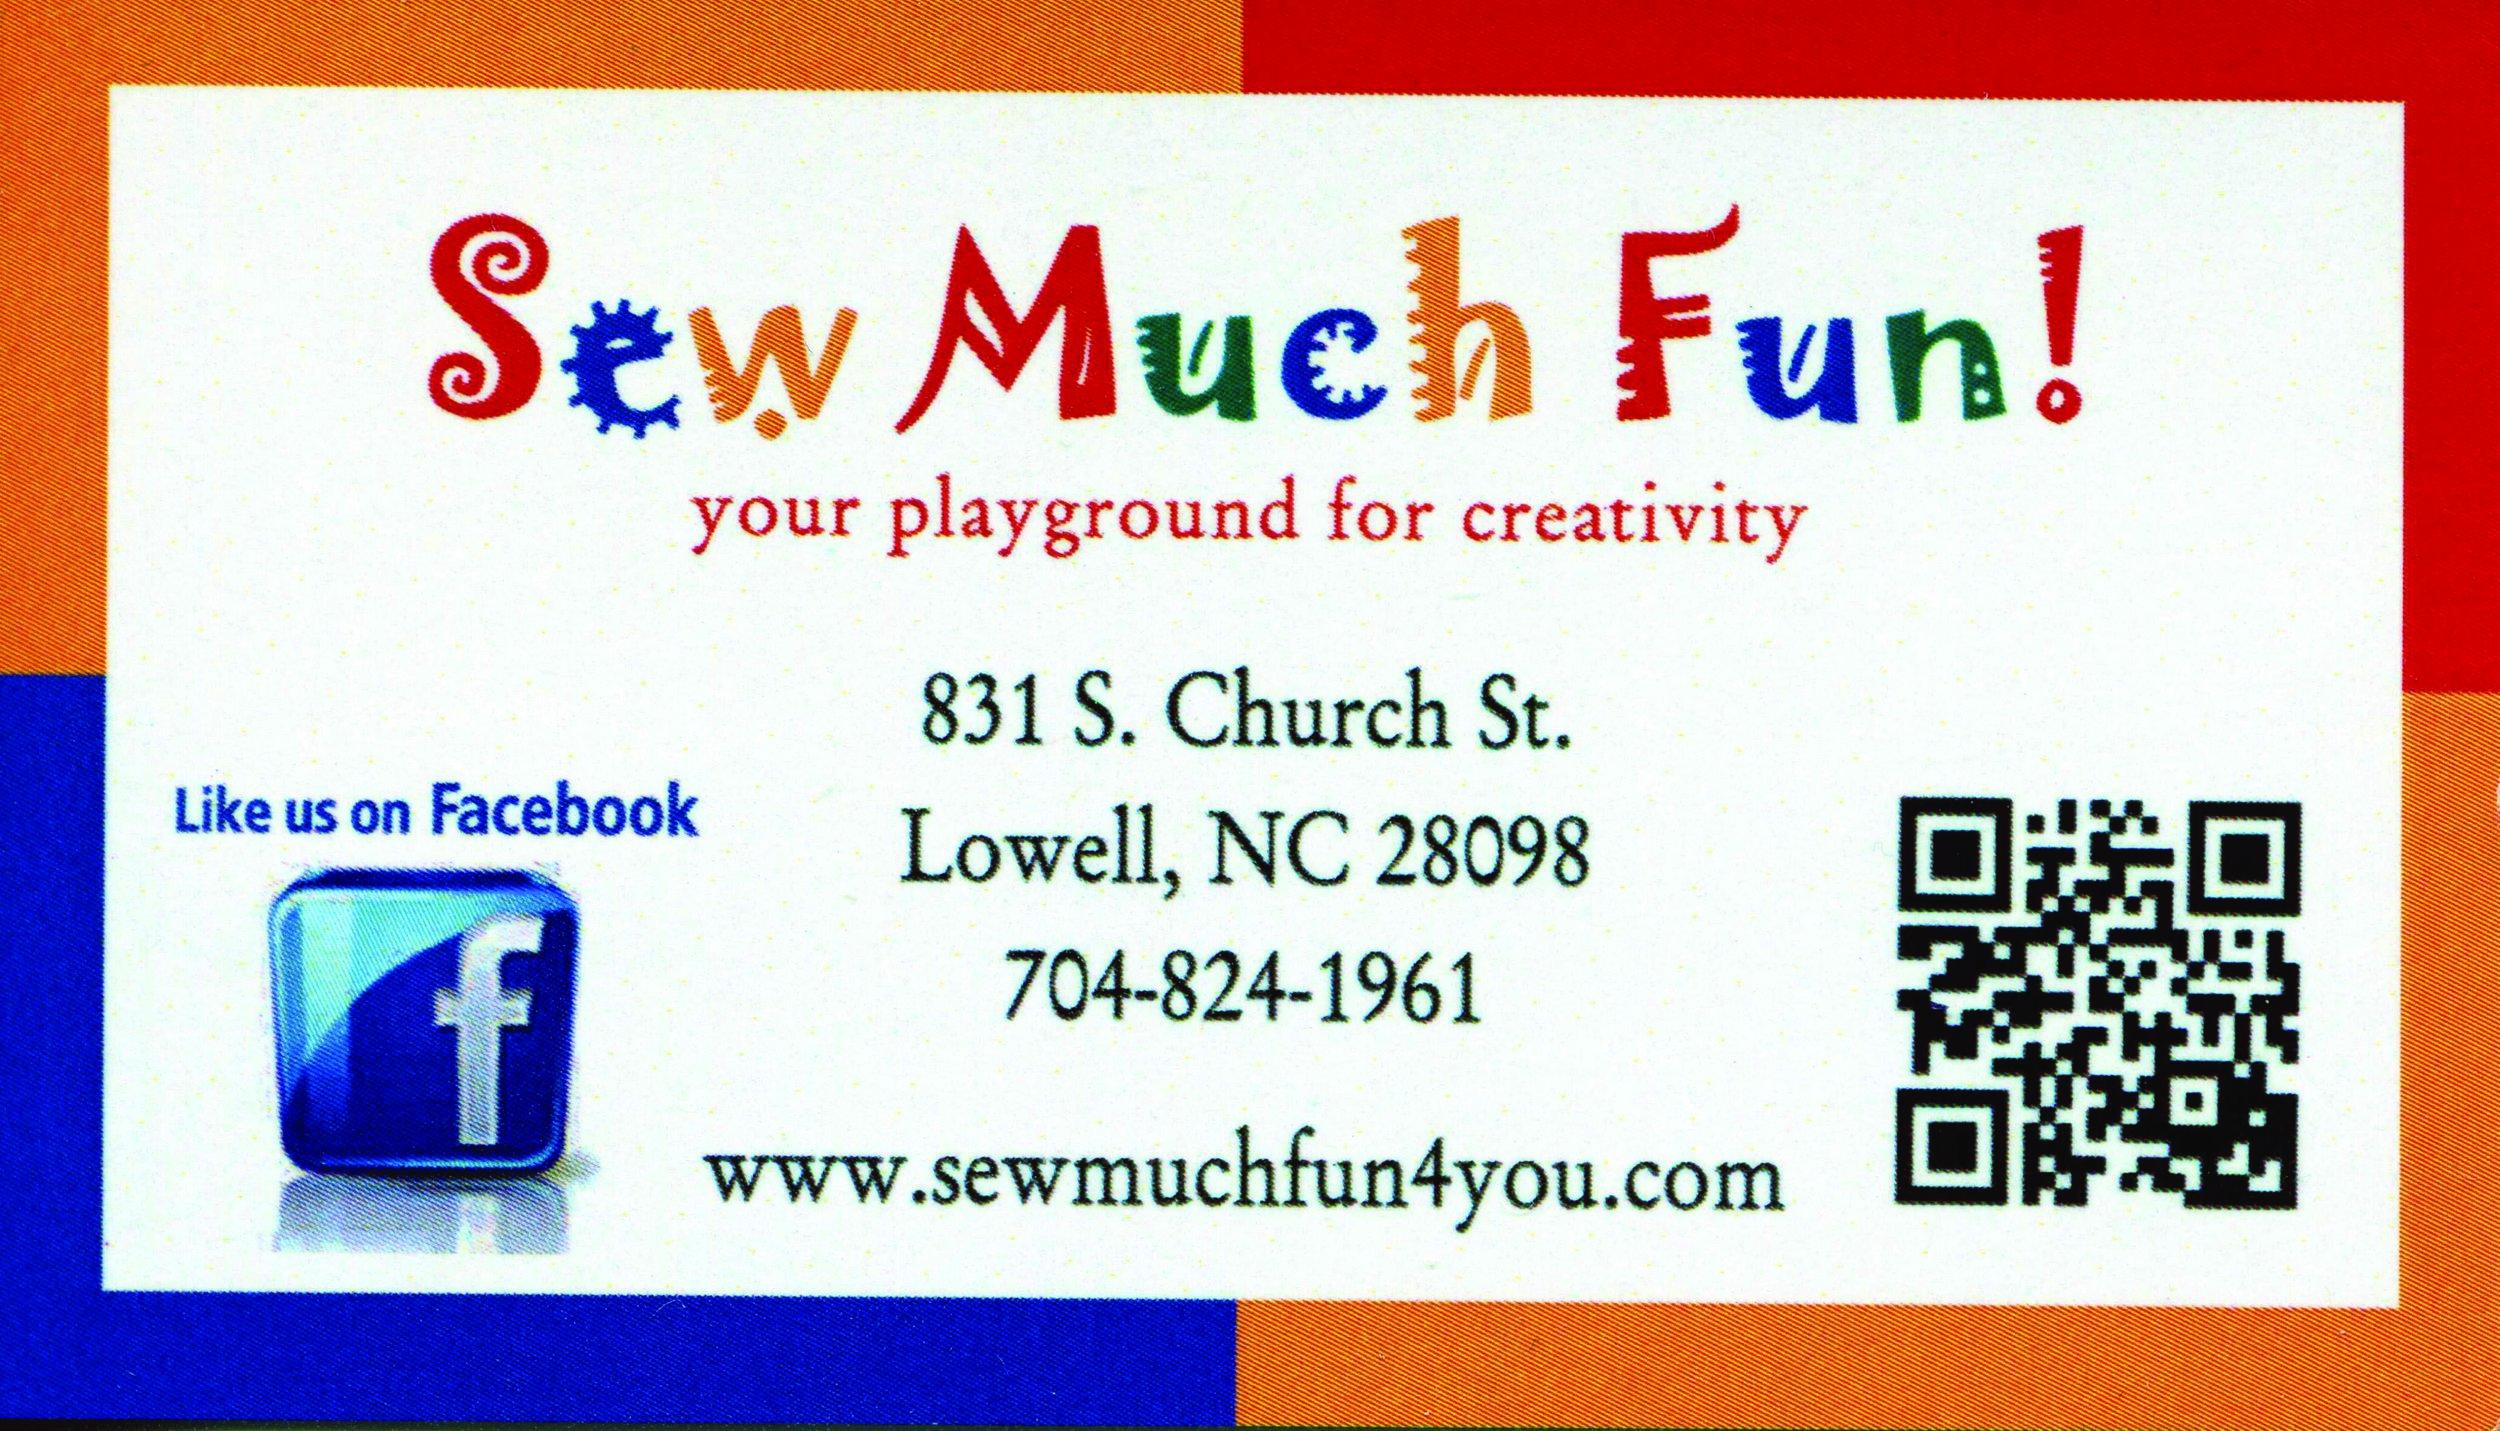 Sew_Much_Fun_Front_Rev.jpg